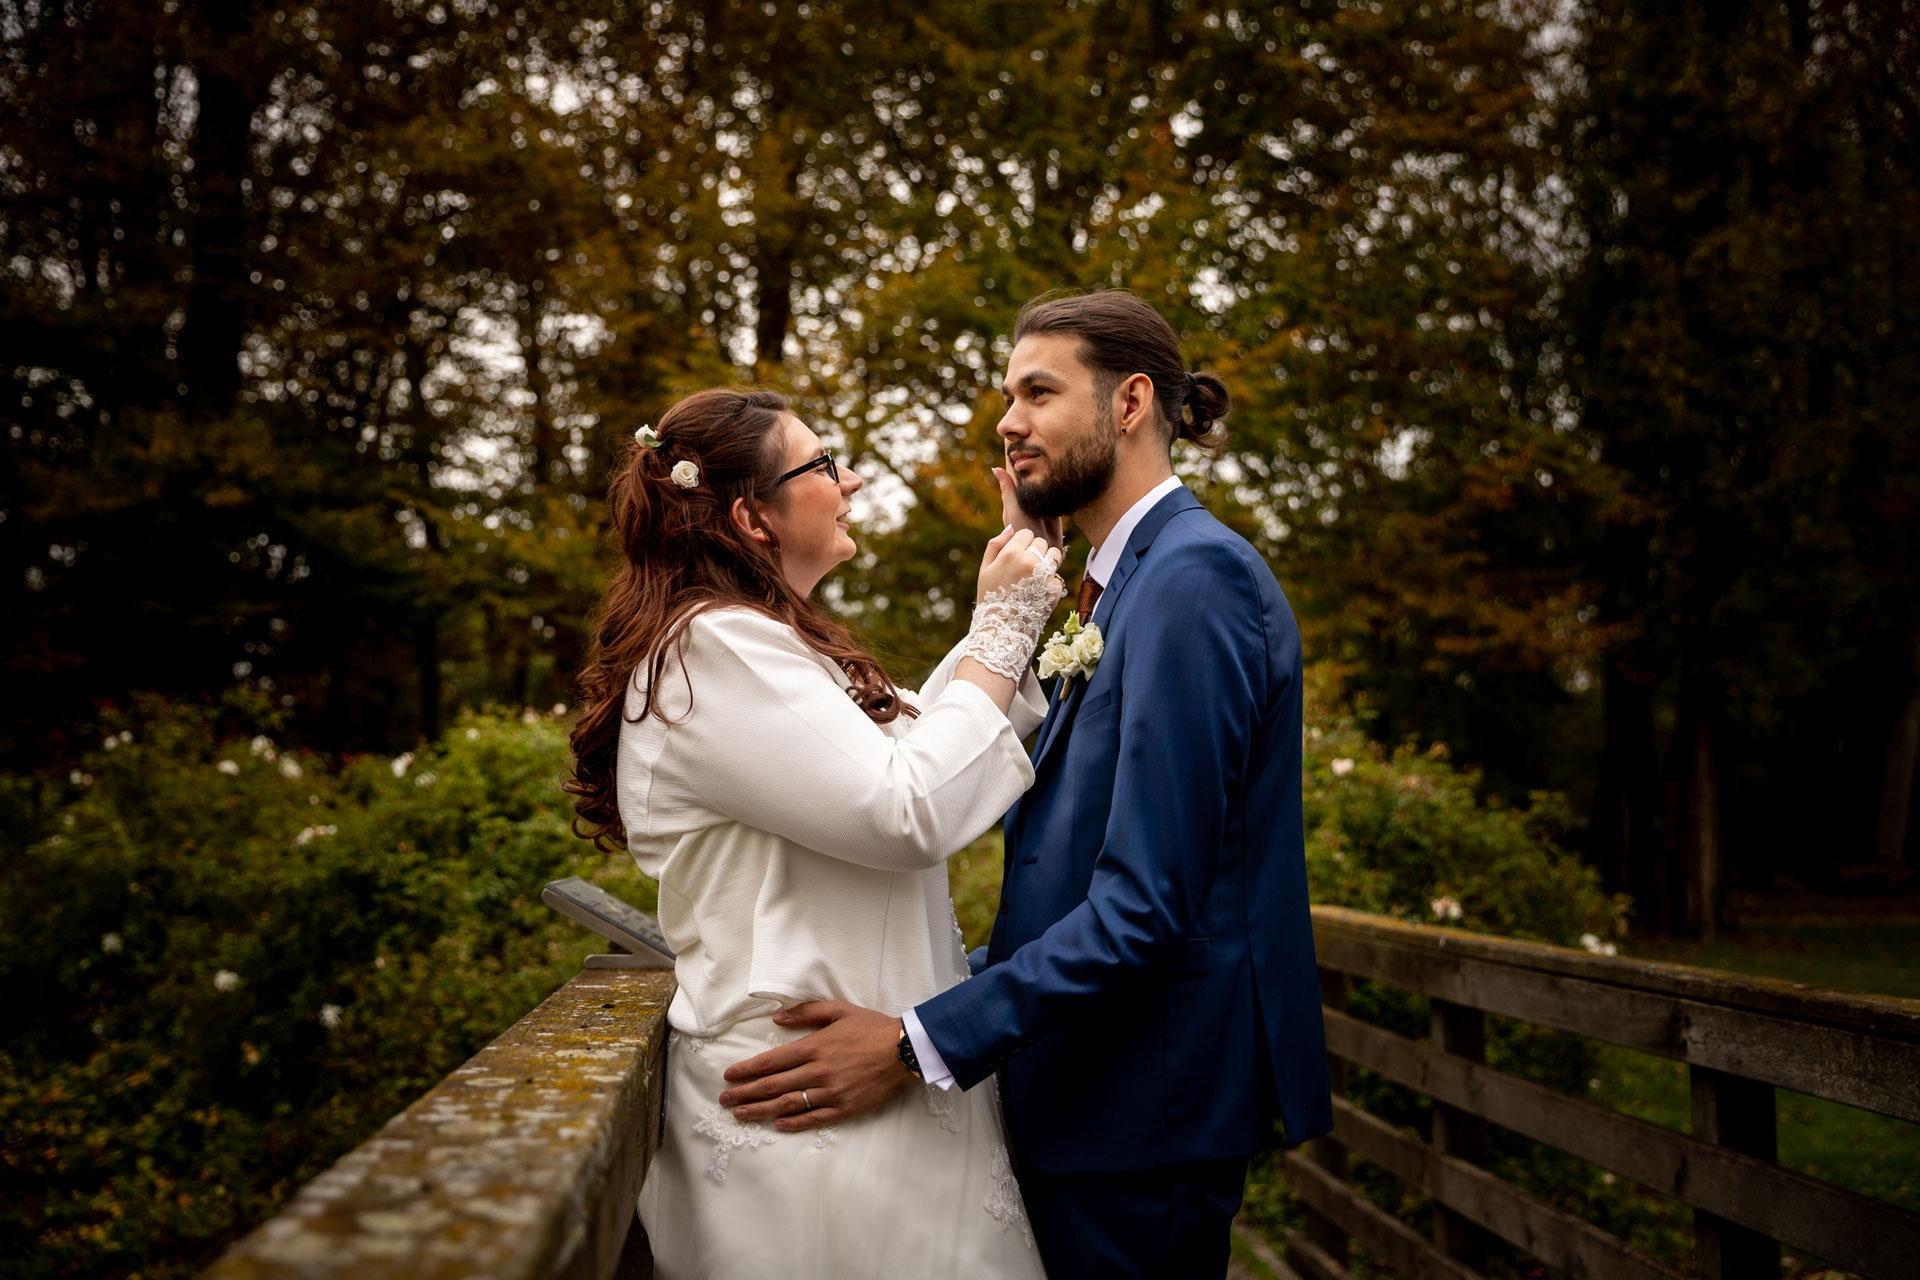 20201017-mariage-justine-alexandre-41